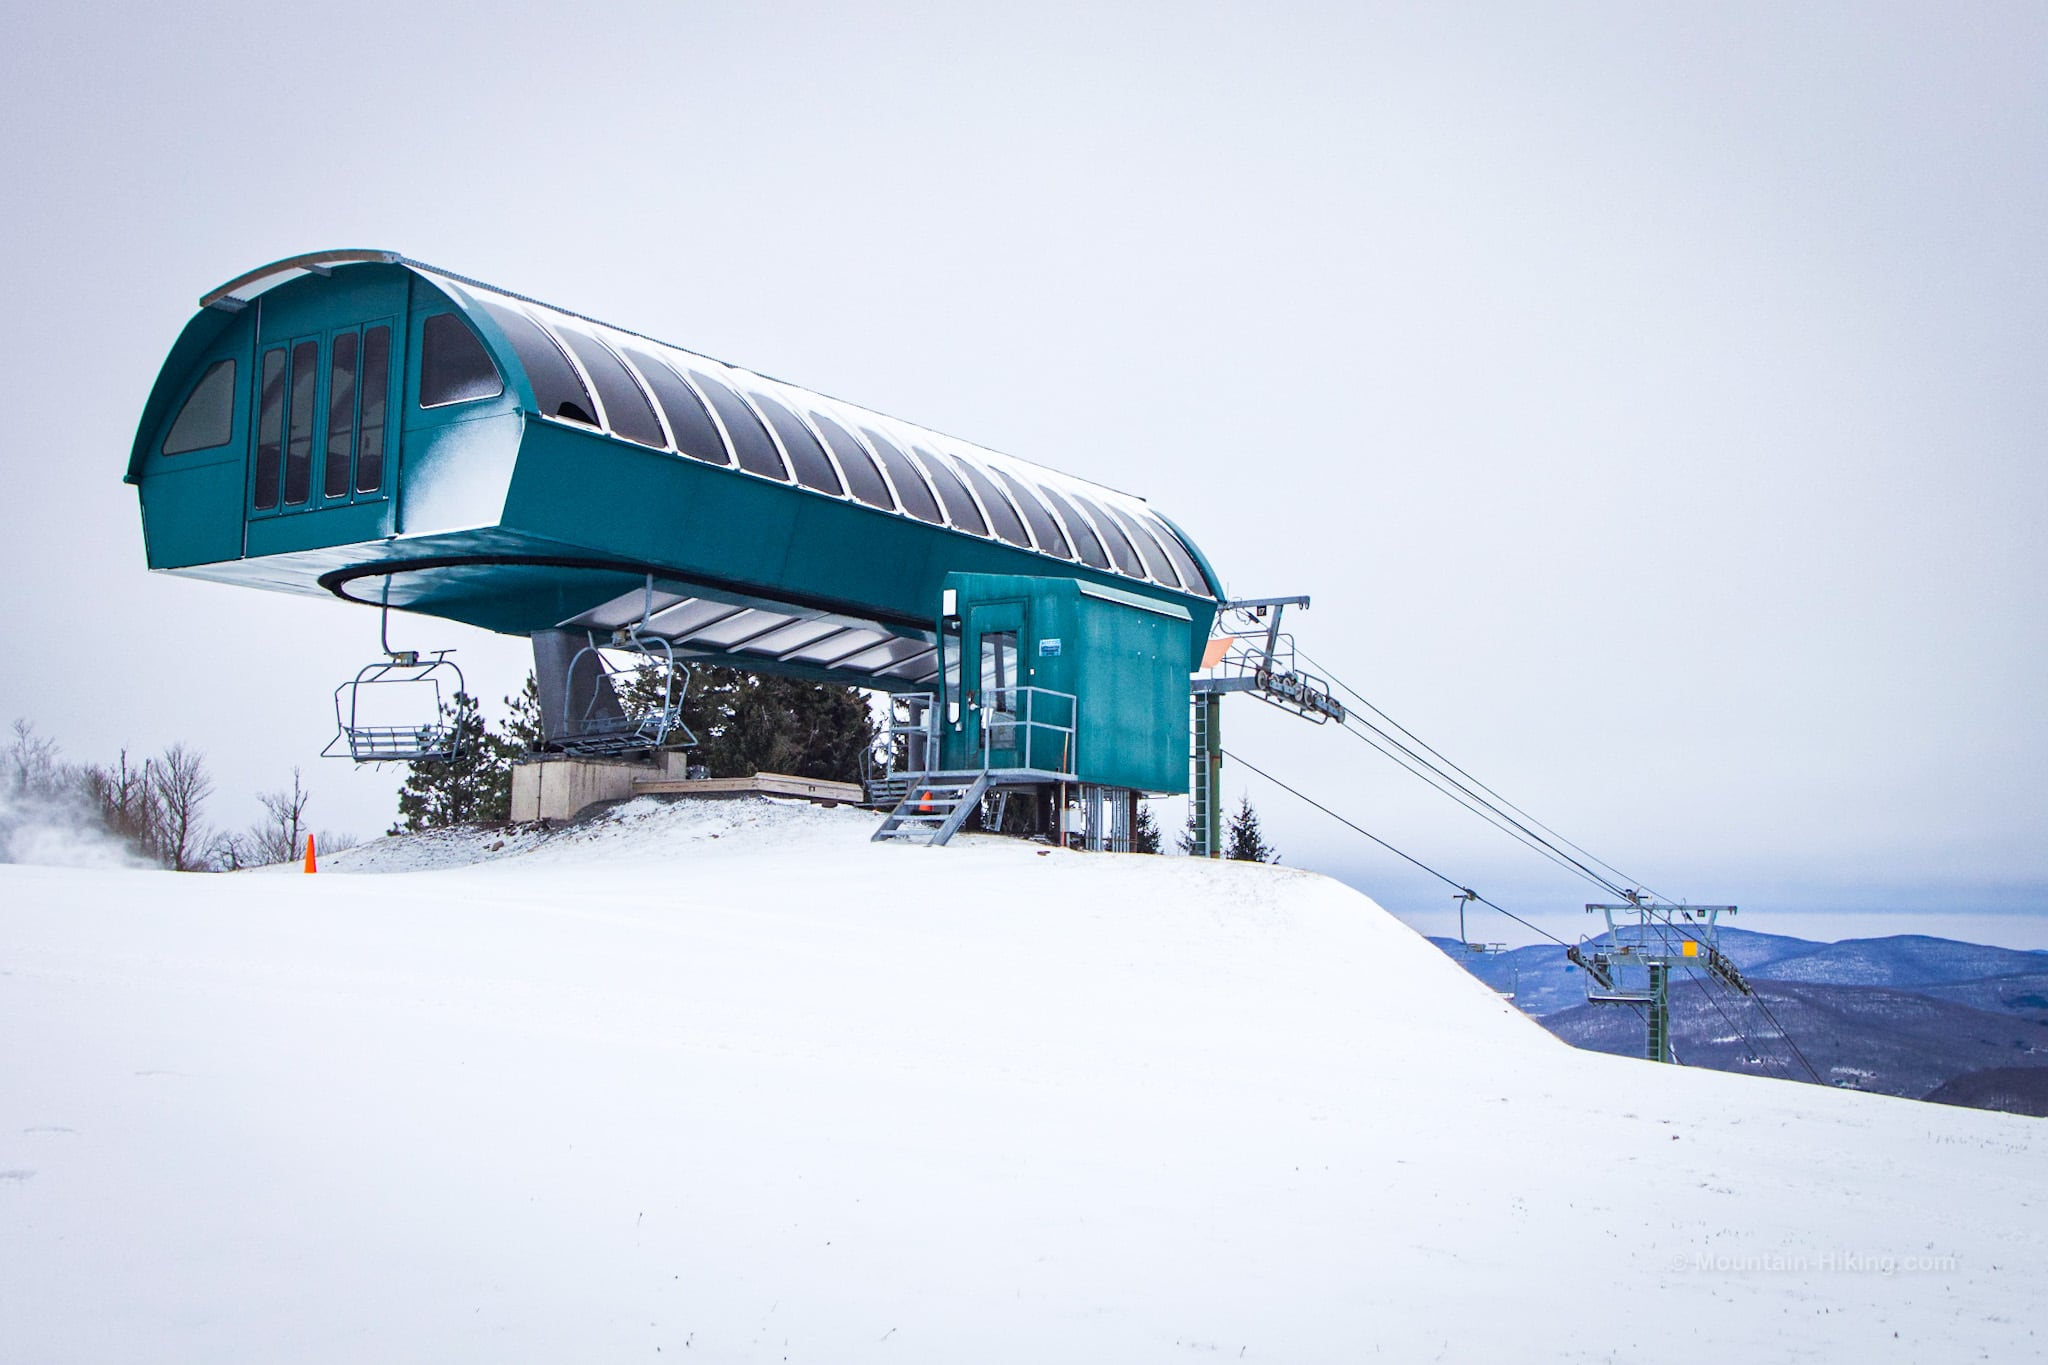 green ski lift building in snow